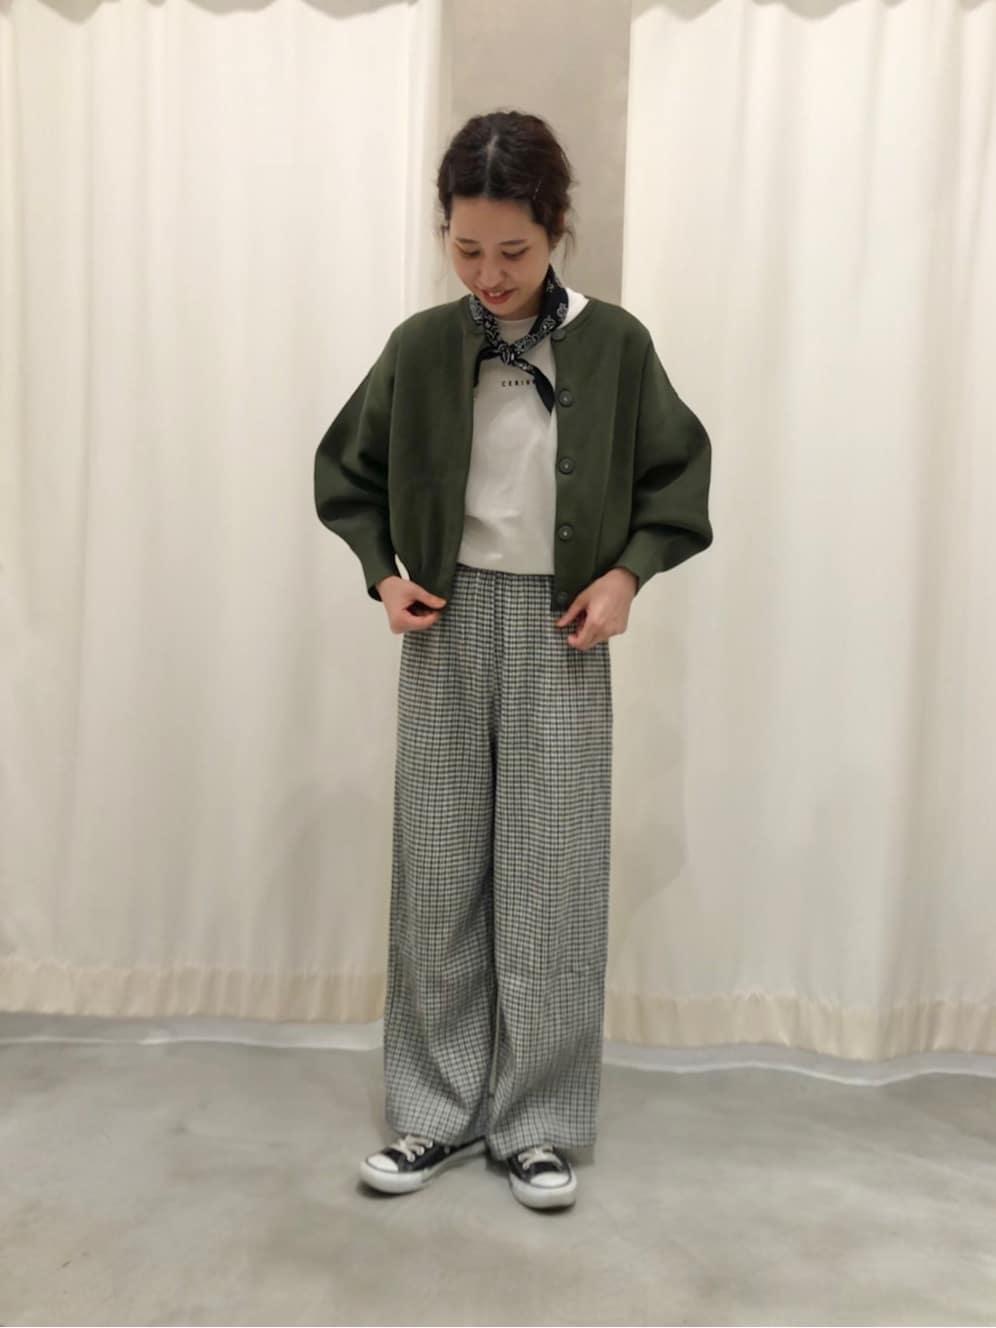 - CHILD WOMAN CHILD WOMAN , PAR ICI 東京スカイツリータウン・ソラマチ 身長:160cm 2021.08.13